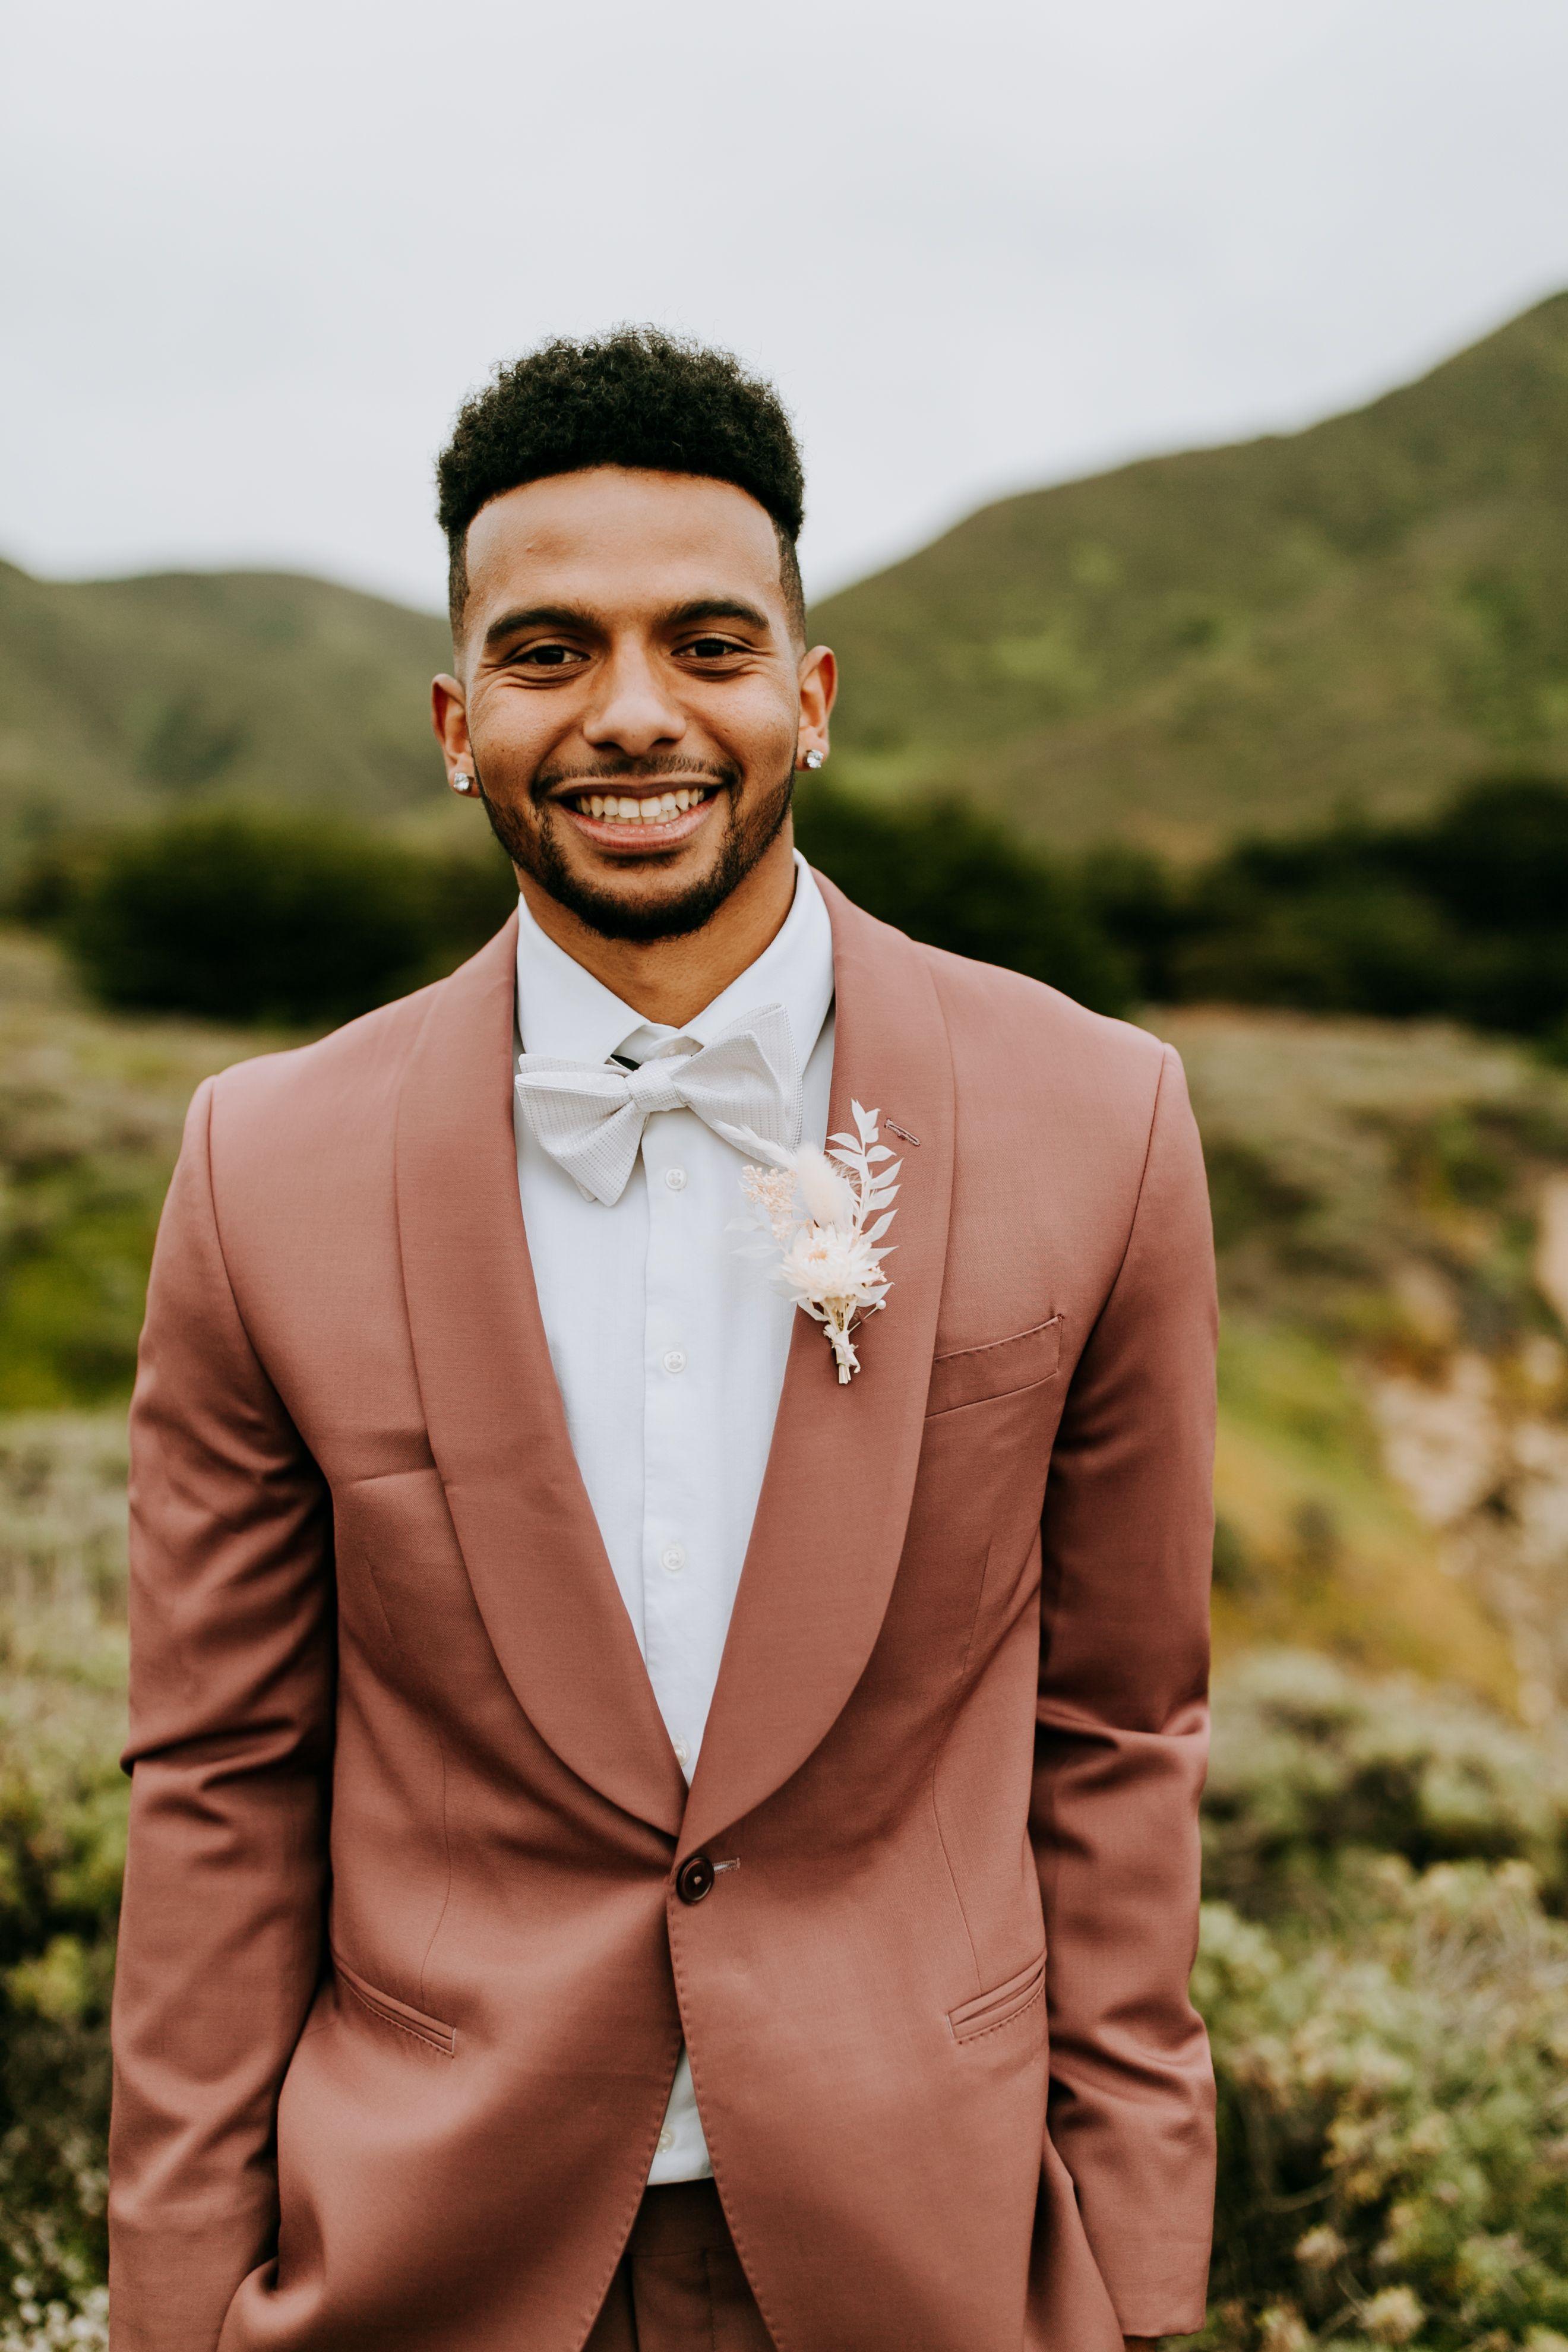 Colored wedding suit in 2020 maroon wedding suit